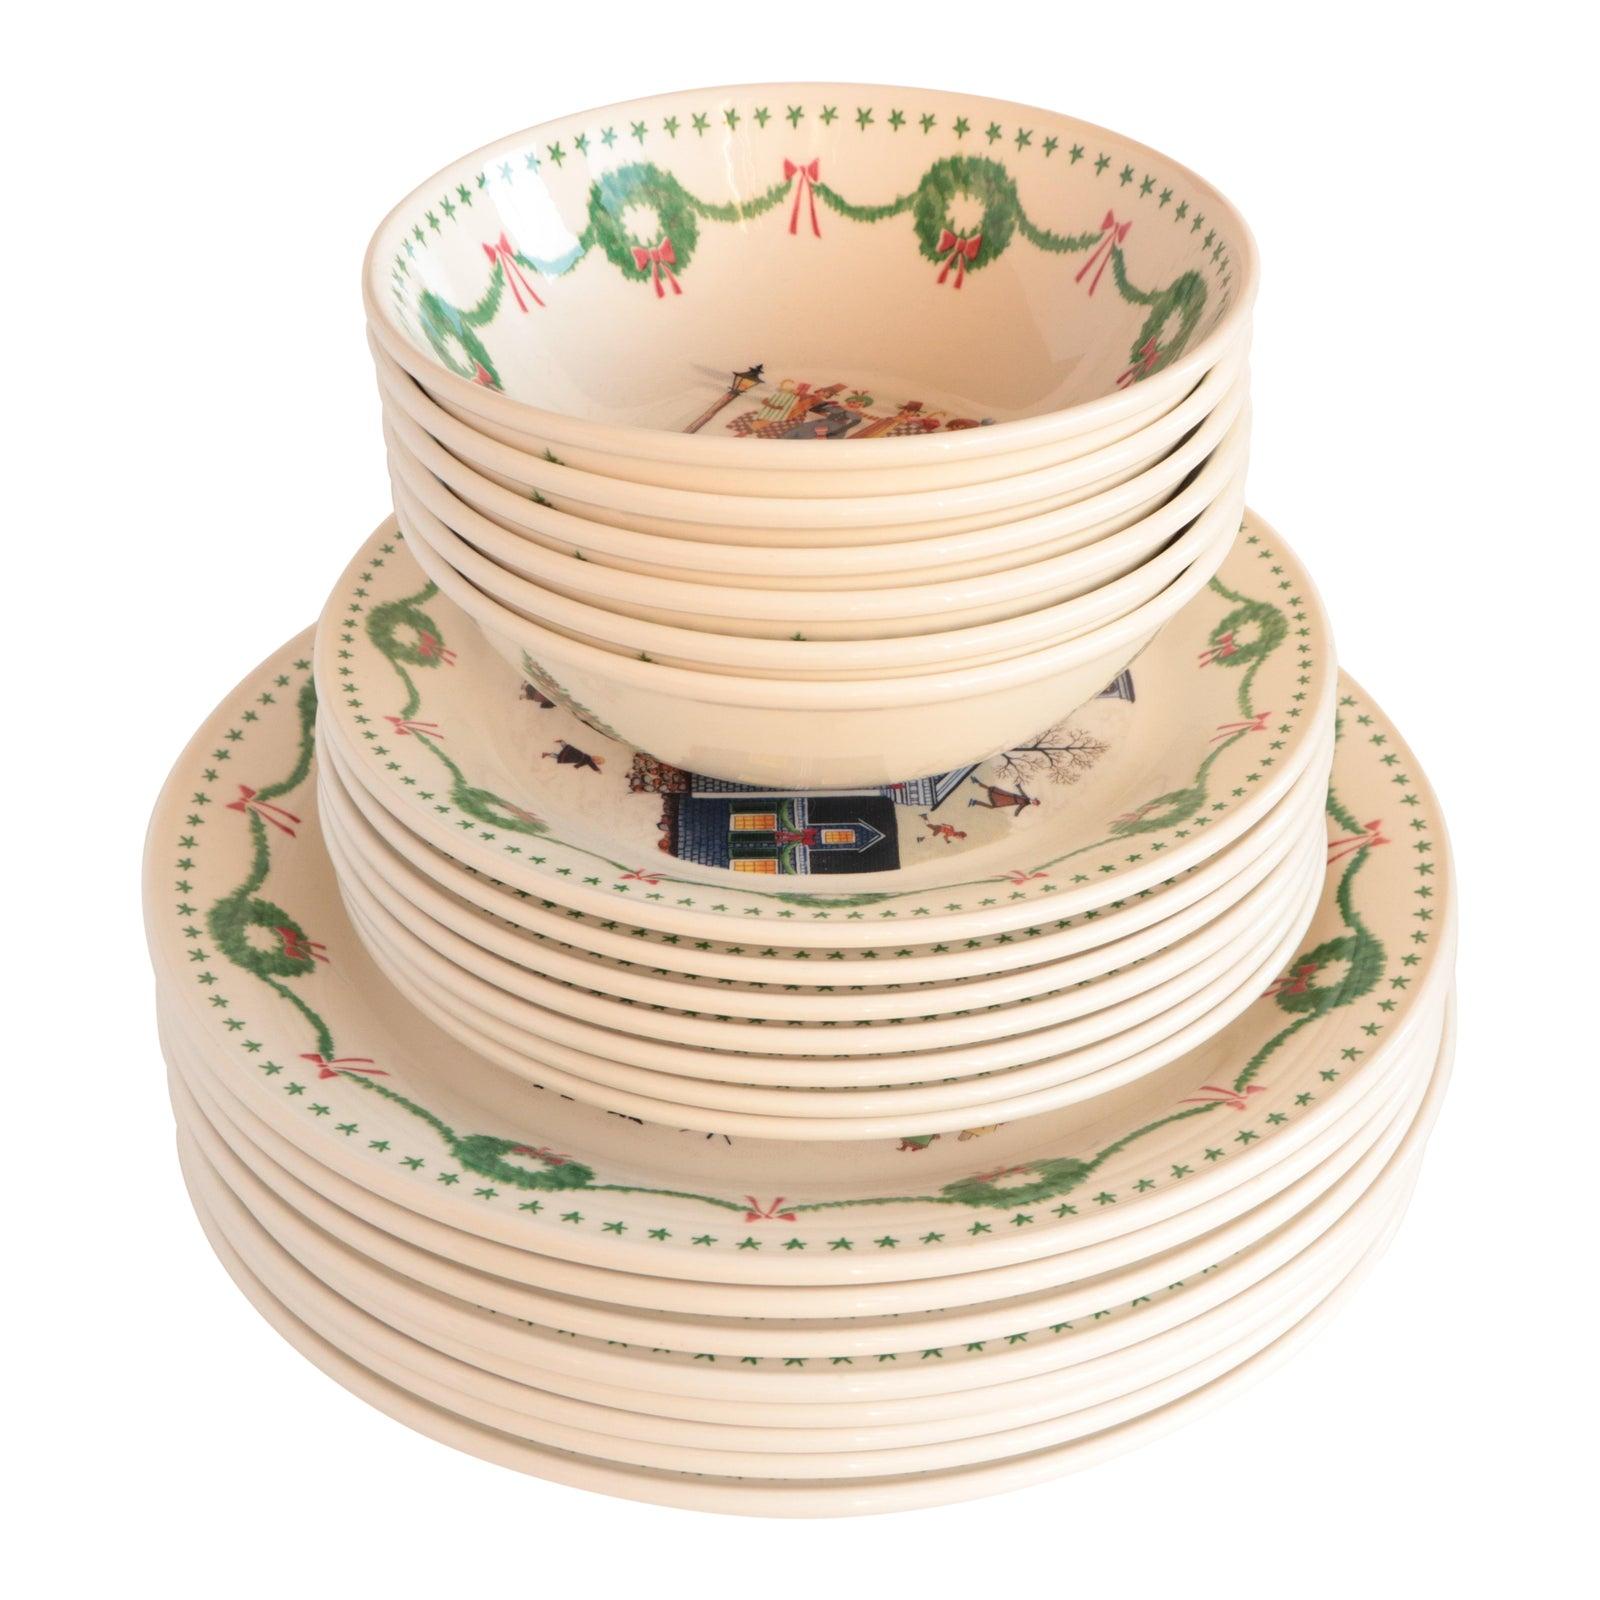 Charles Wysocki Americana Christmas Dinnerware - 21 Pieces | Chairish